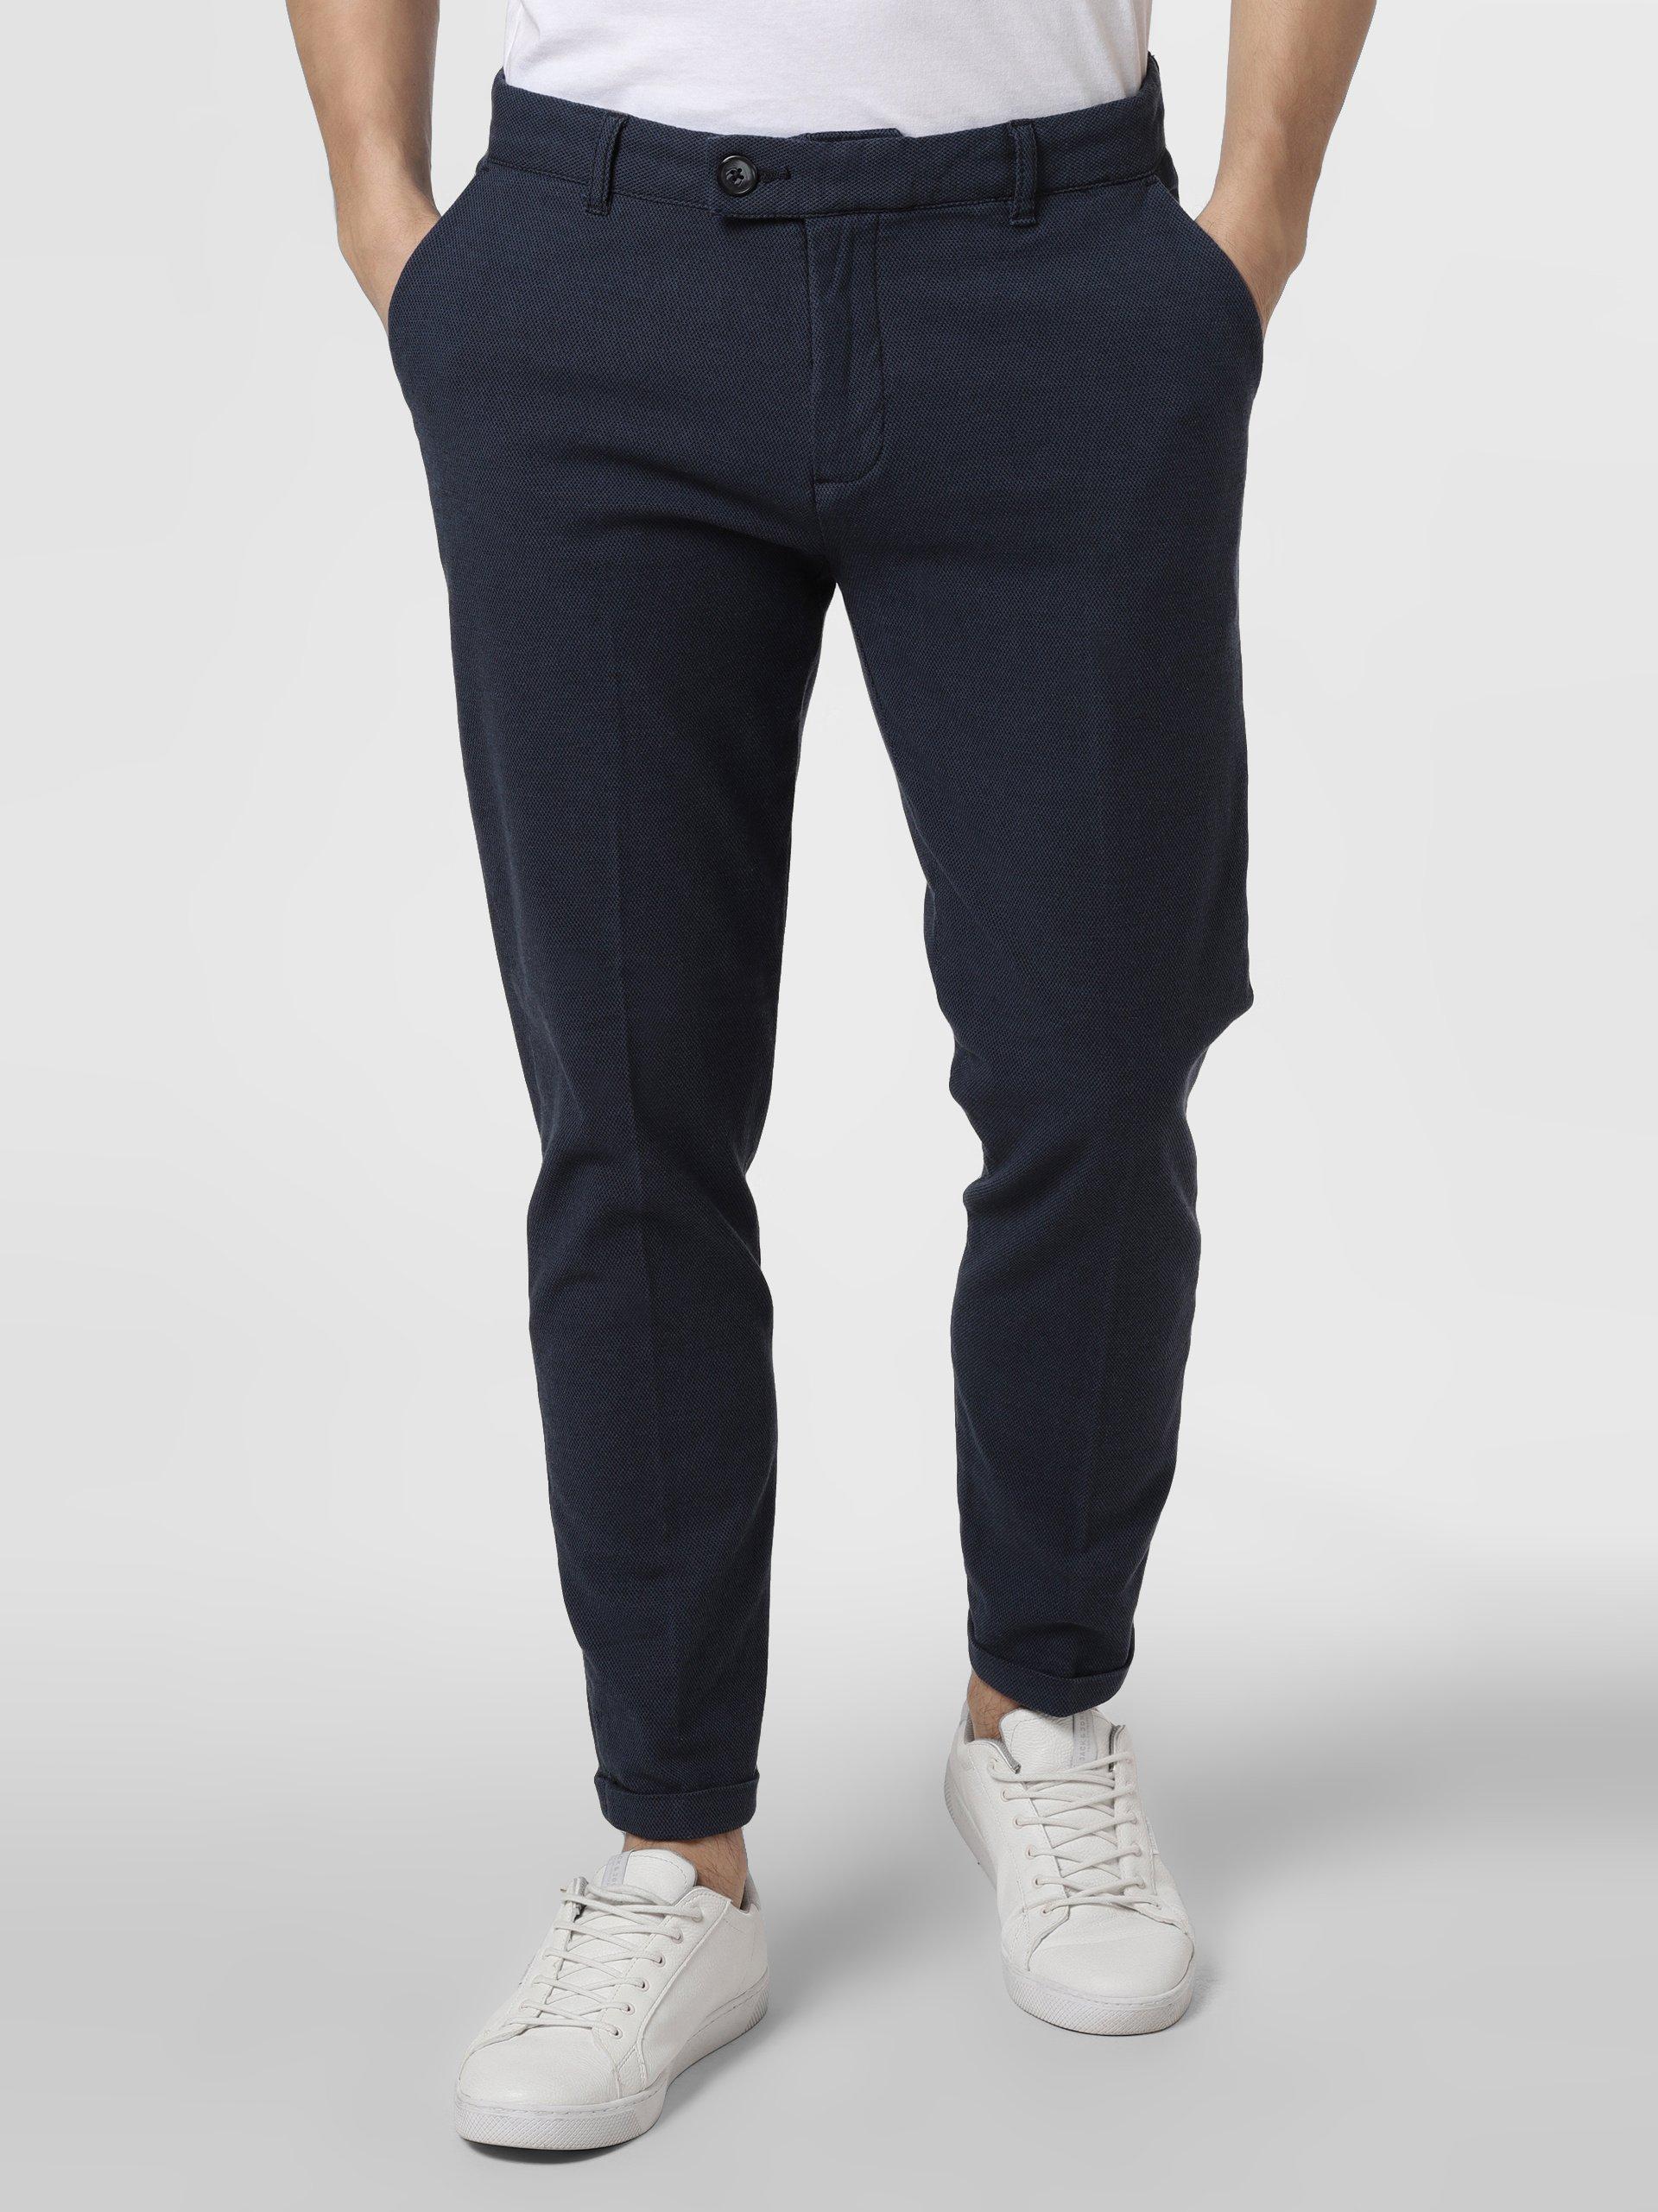 Redefined Rebel Spodnie męskie – Rrercan